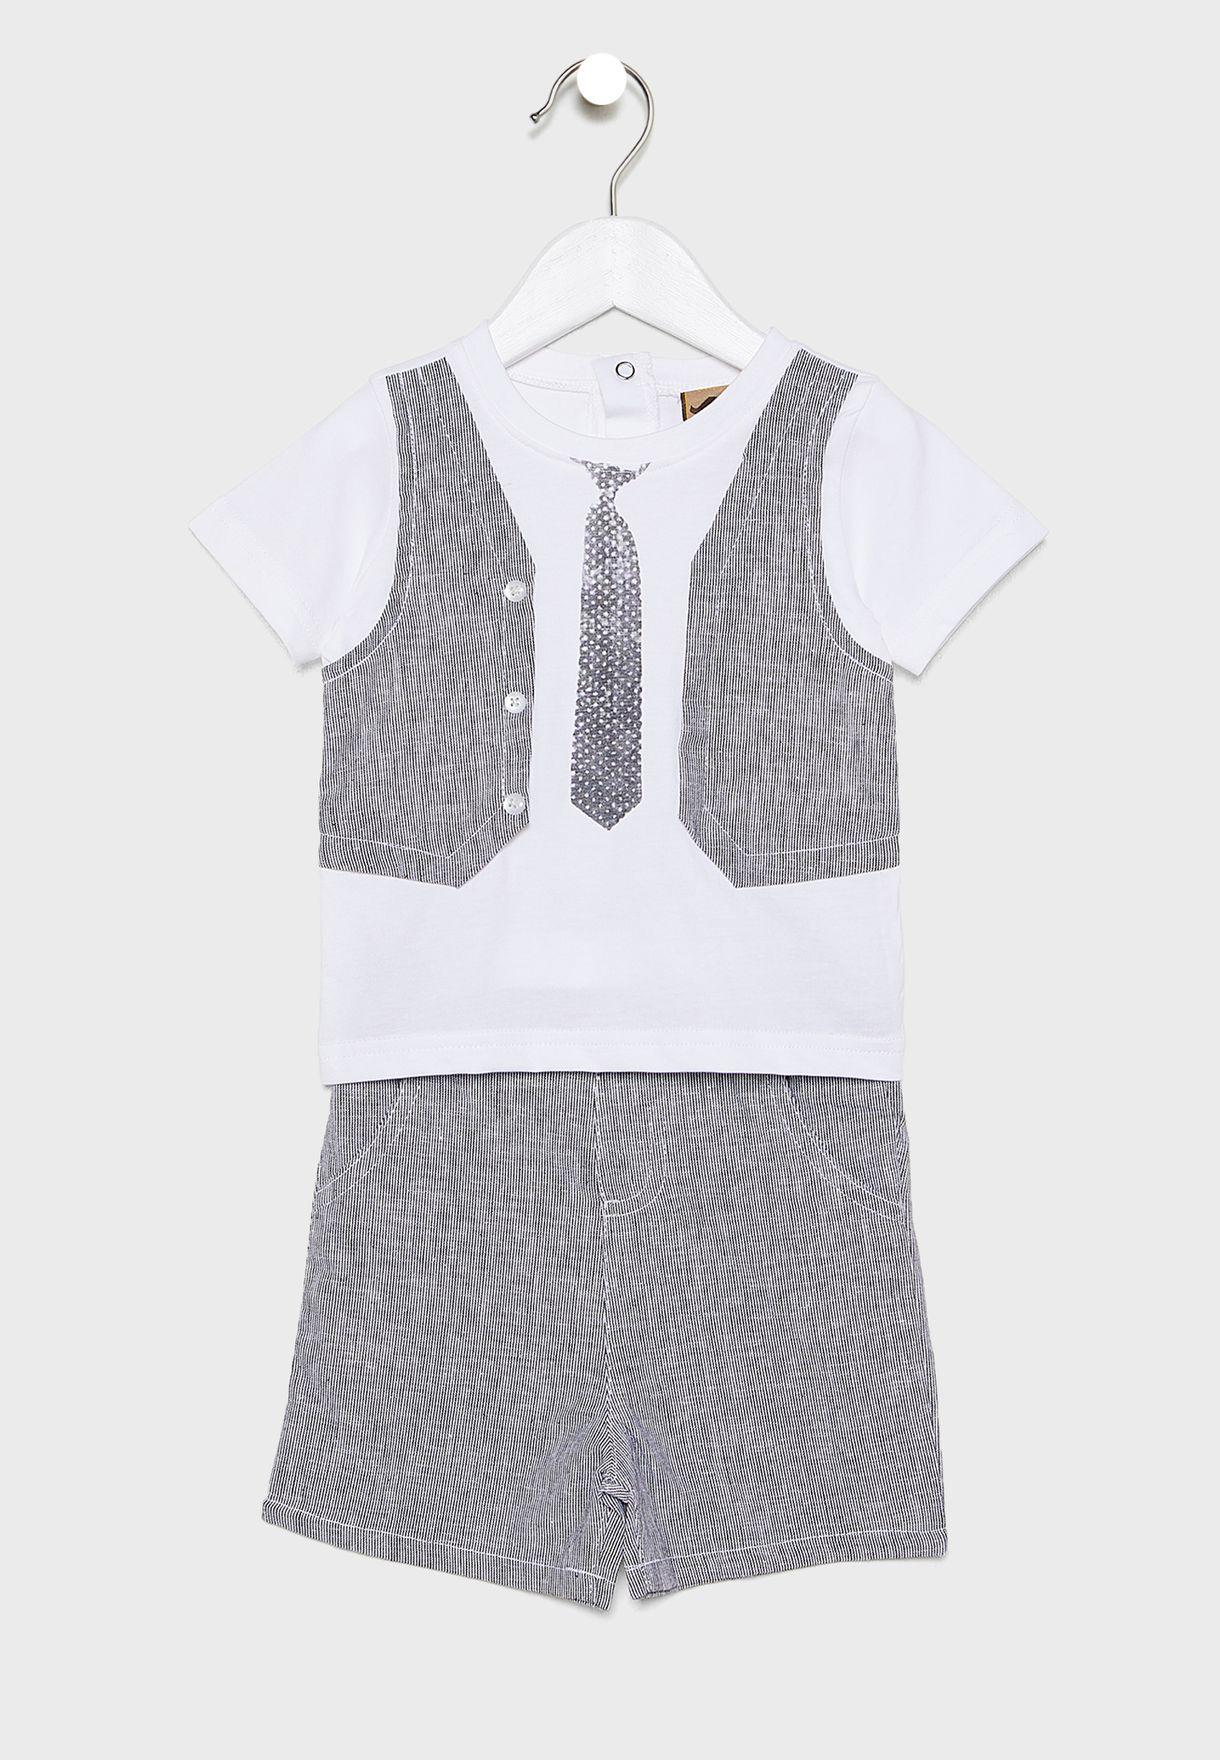 Infant 2 Piece Gift Set